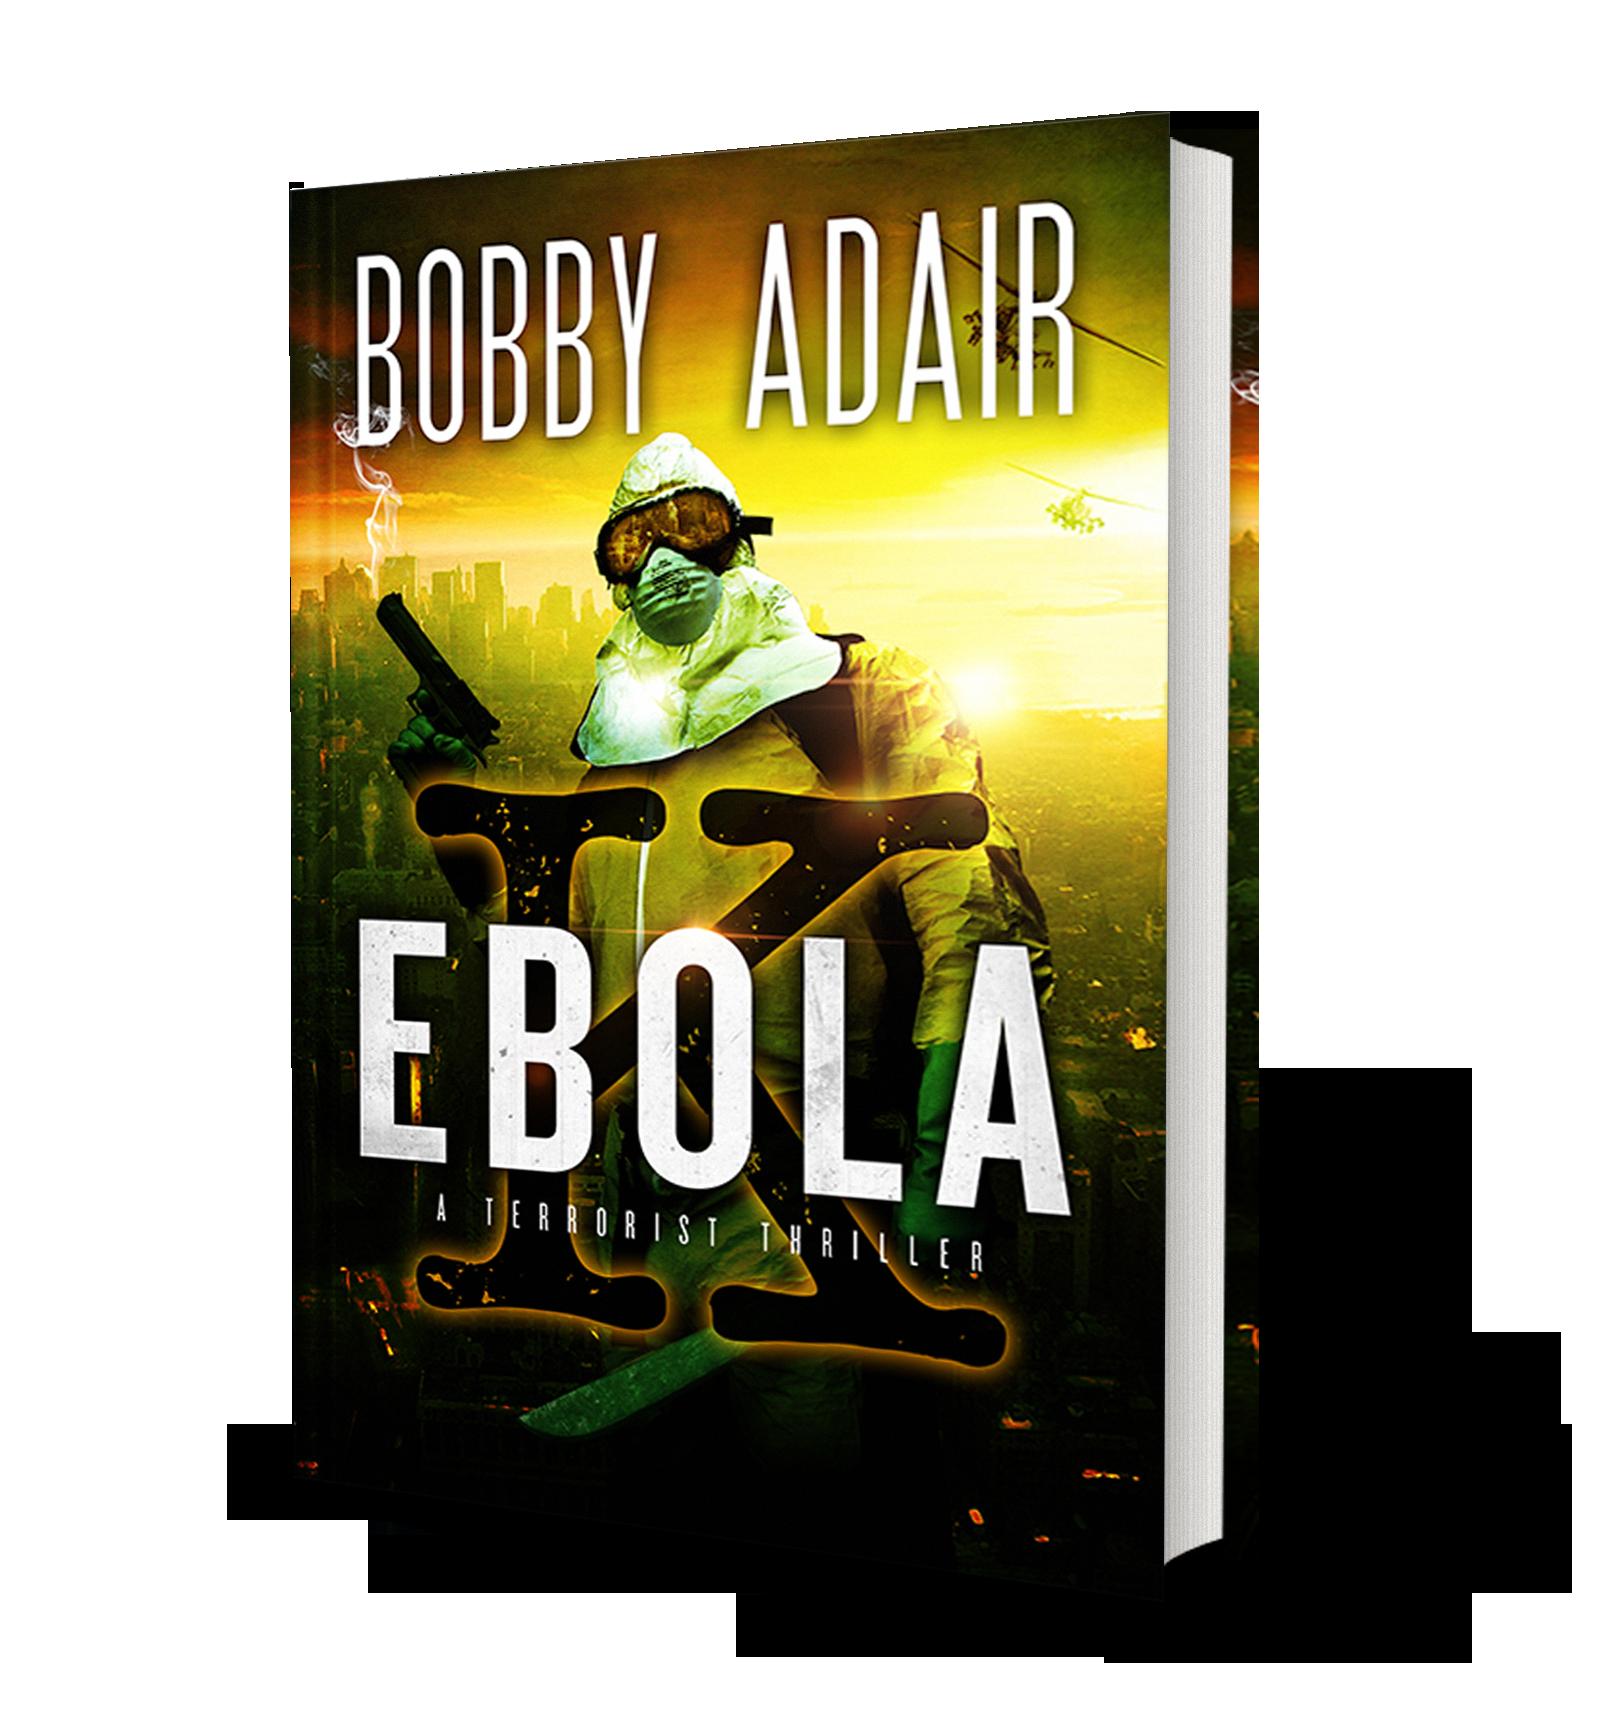 ebola cover 3d book promo 1.png